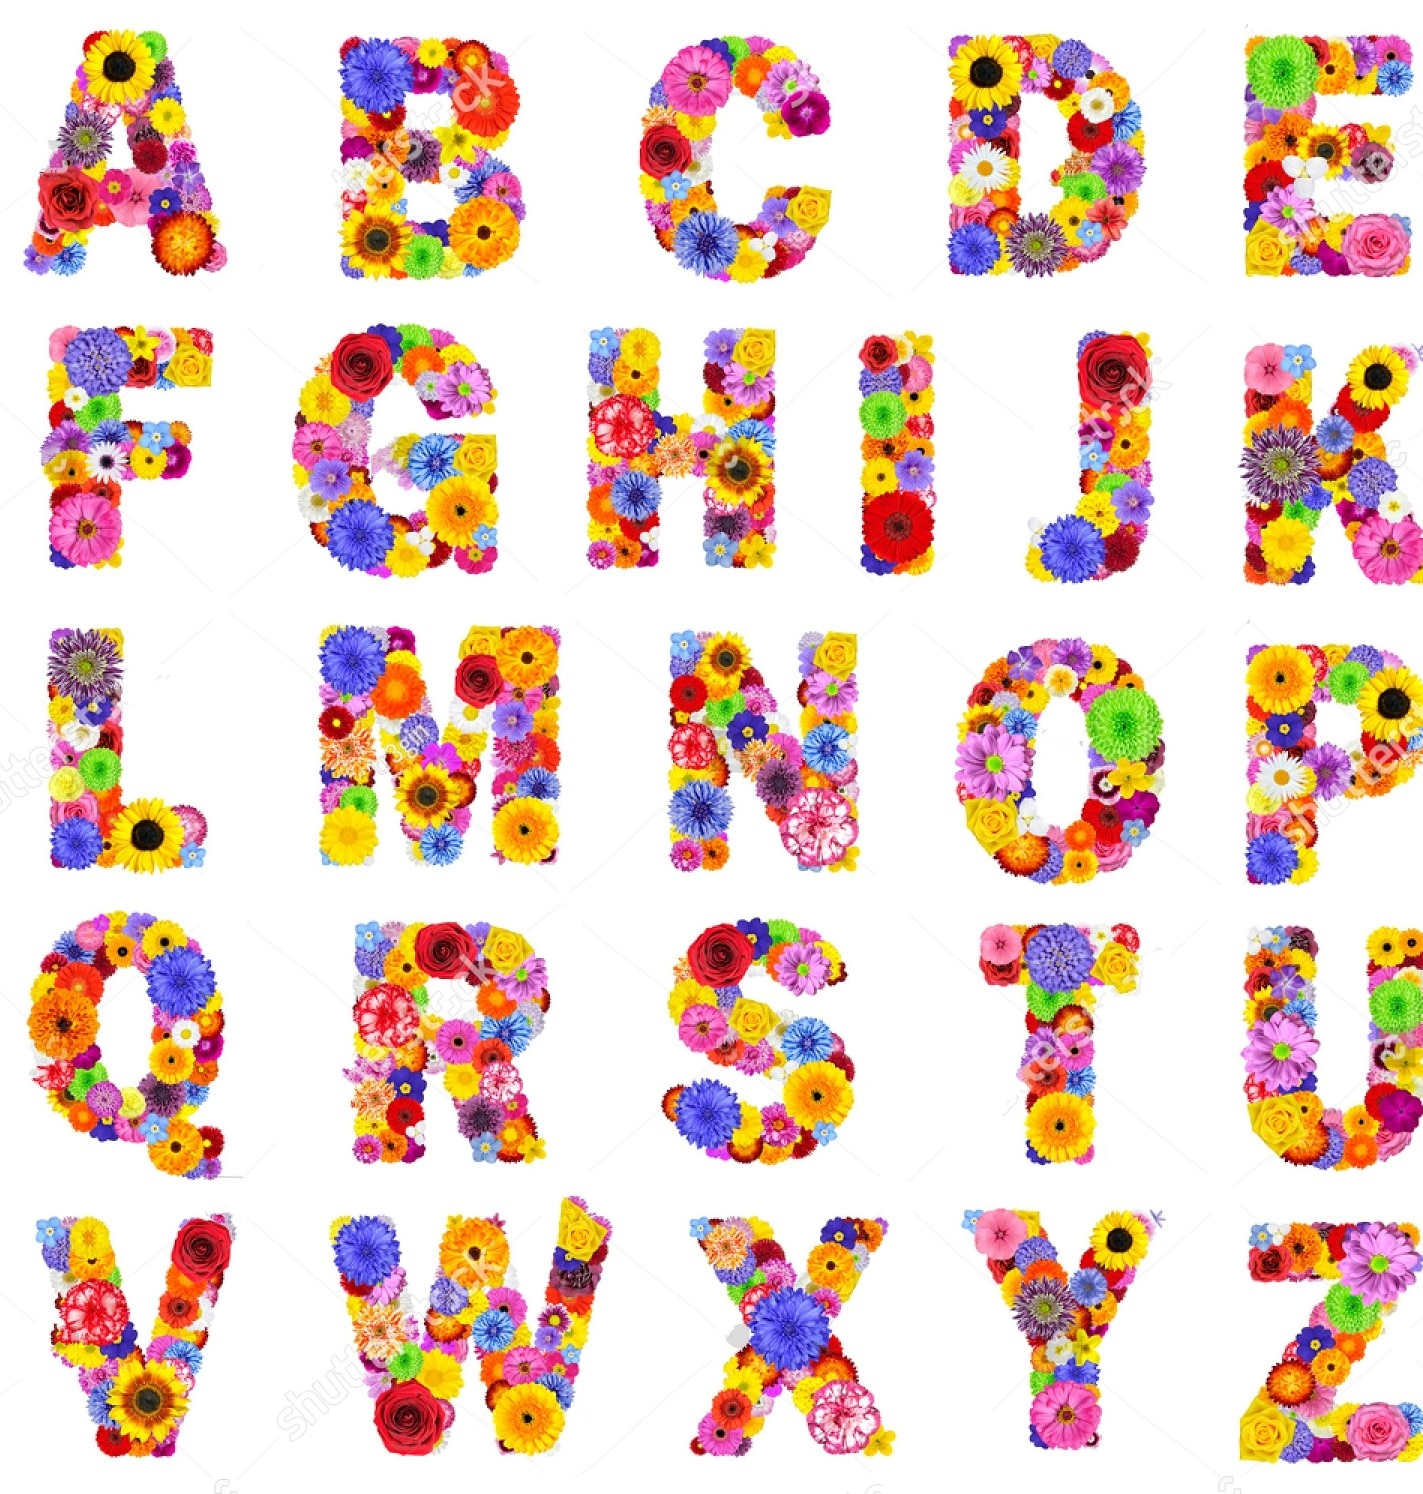 JMINE Div 5D letras C D E alfabeto de flores de colores pintura completa de diamantes kits de Arte de punto de cruz pintura 3D escénica por diamantes